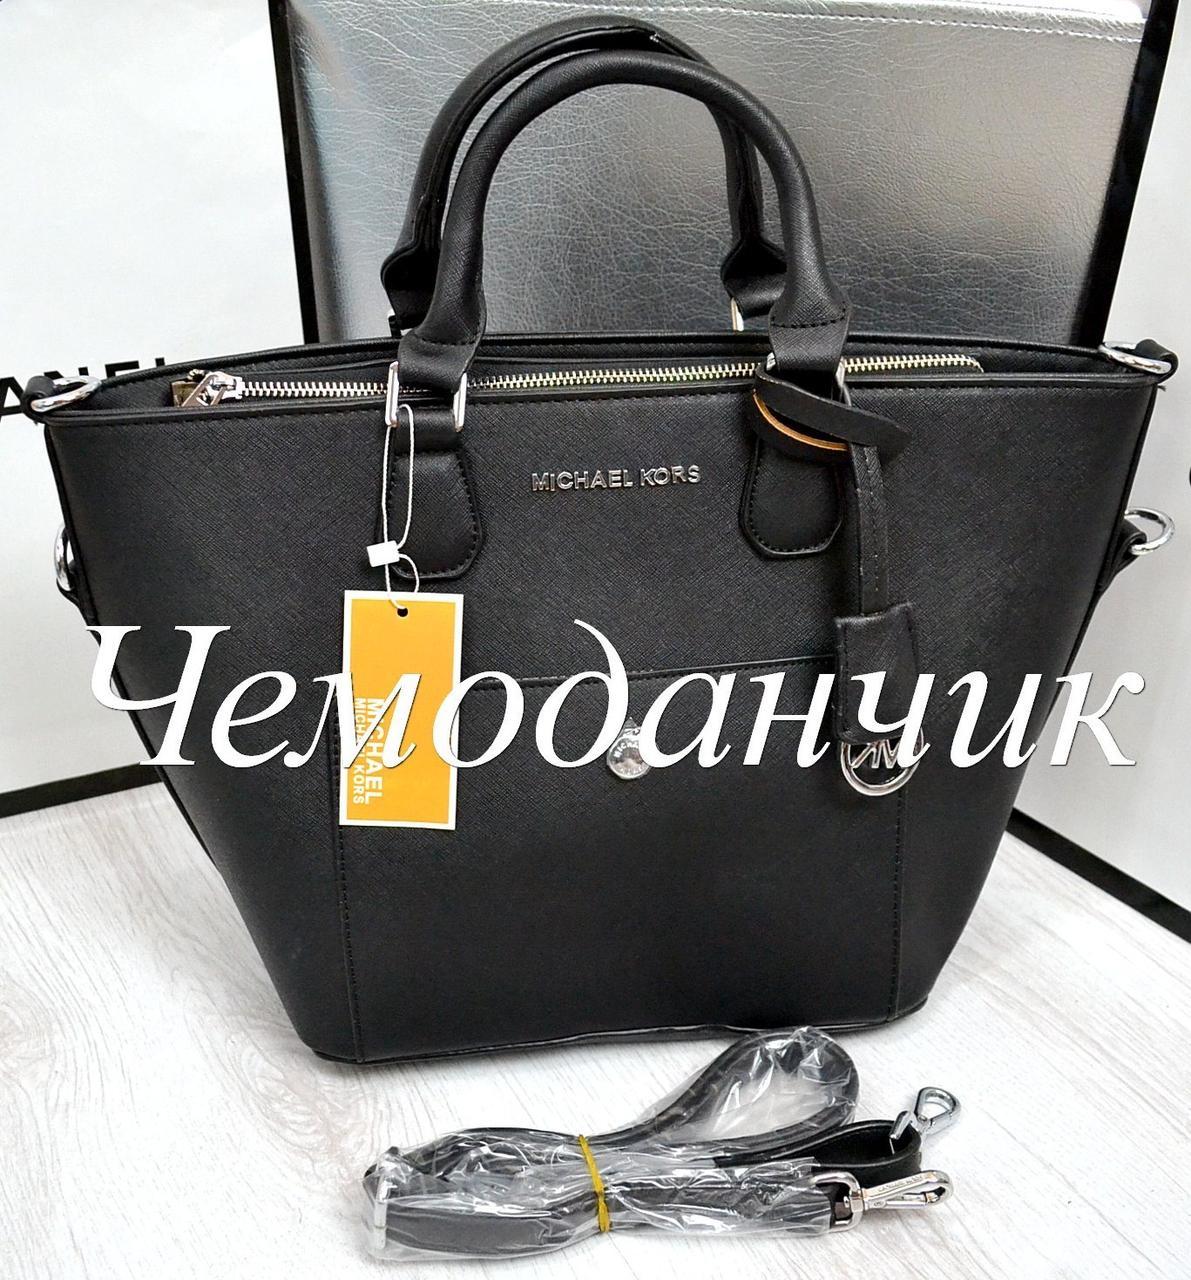 33c0c474f965 Сумочка Майкл Корс (8) : продажа, цена в Одессе. женские сумочки и ...